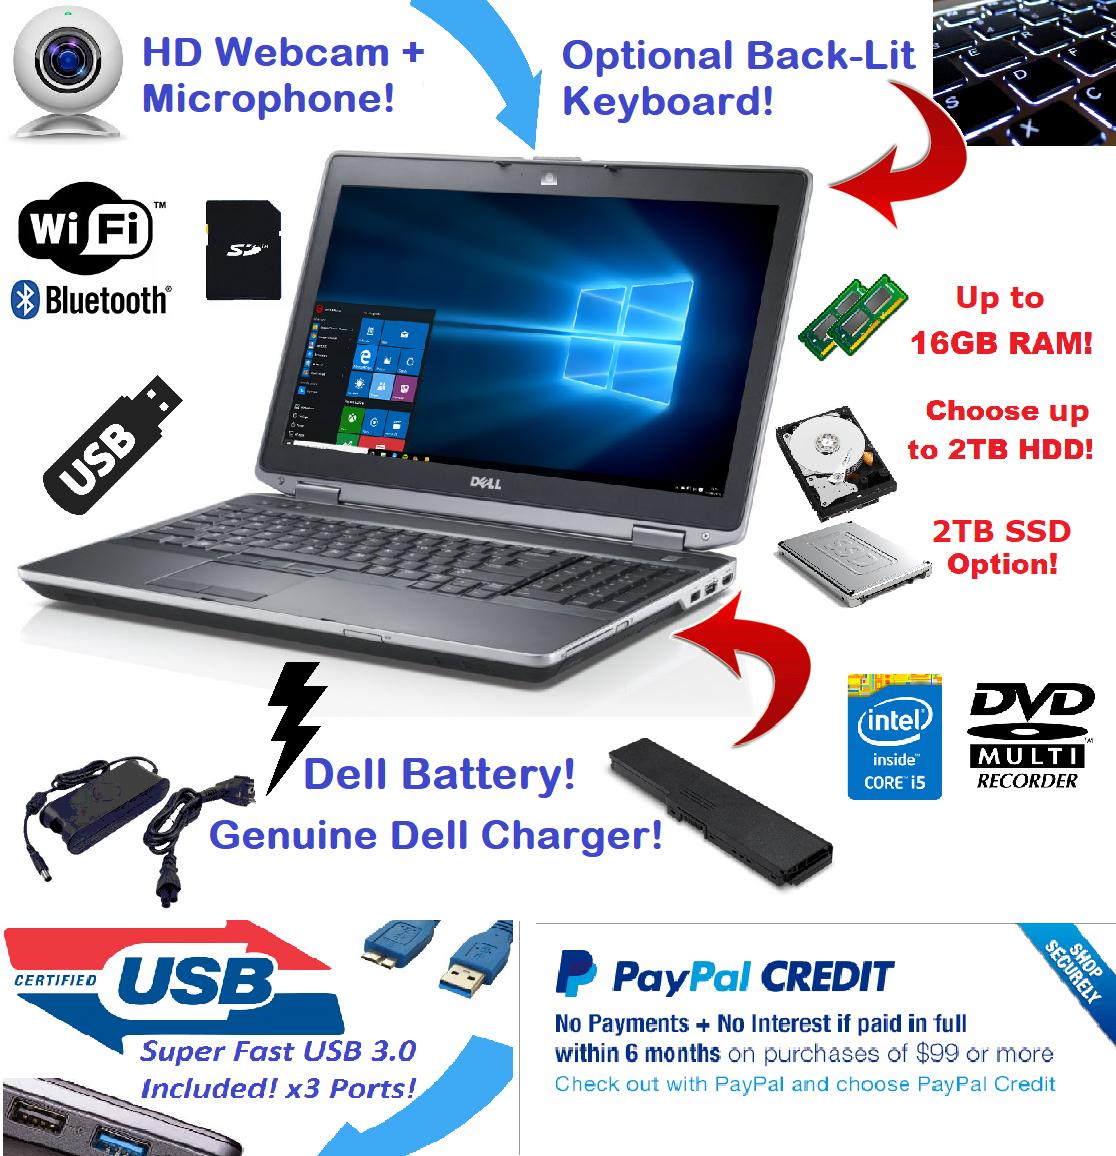 Dell Latitude Laptop 15.6″ Intel i5 2TB SSD 🚩16GB RAM 🎮 WiFI HDMI + Win 10 Pro